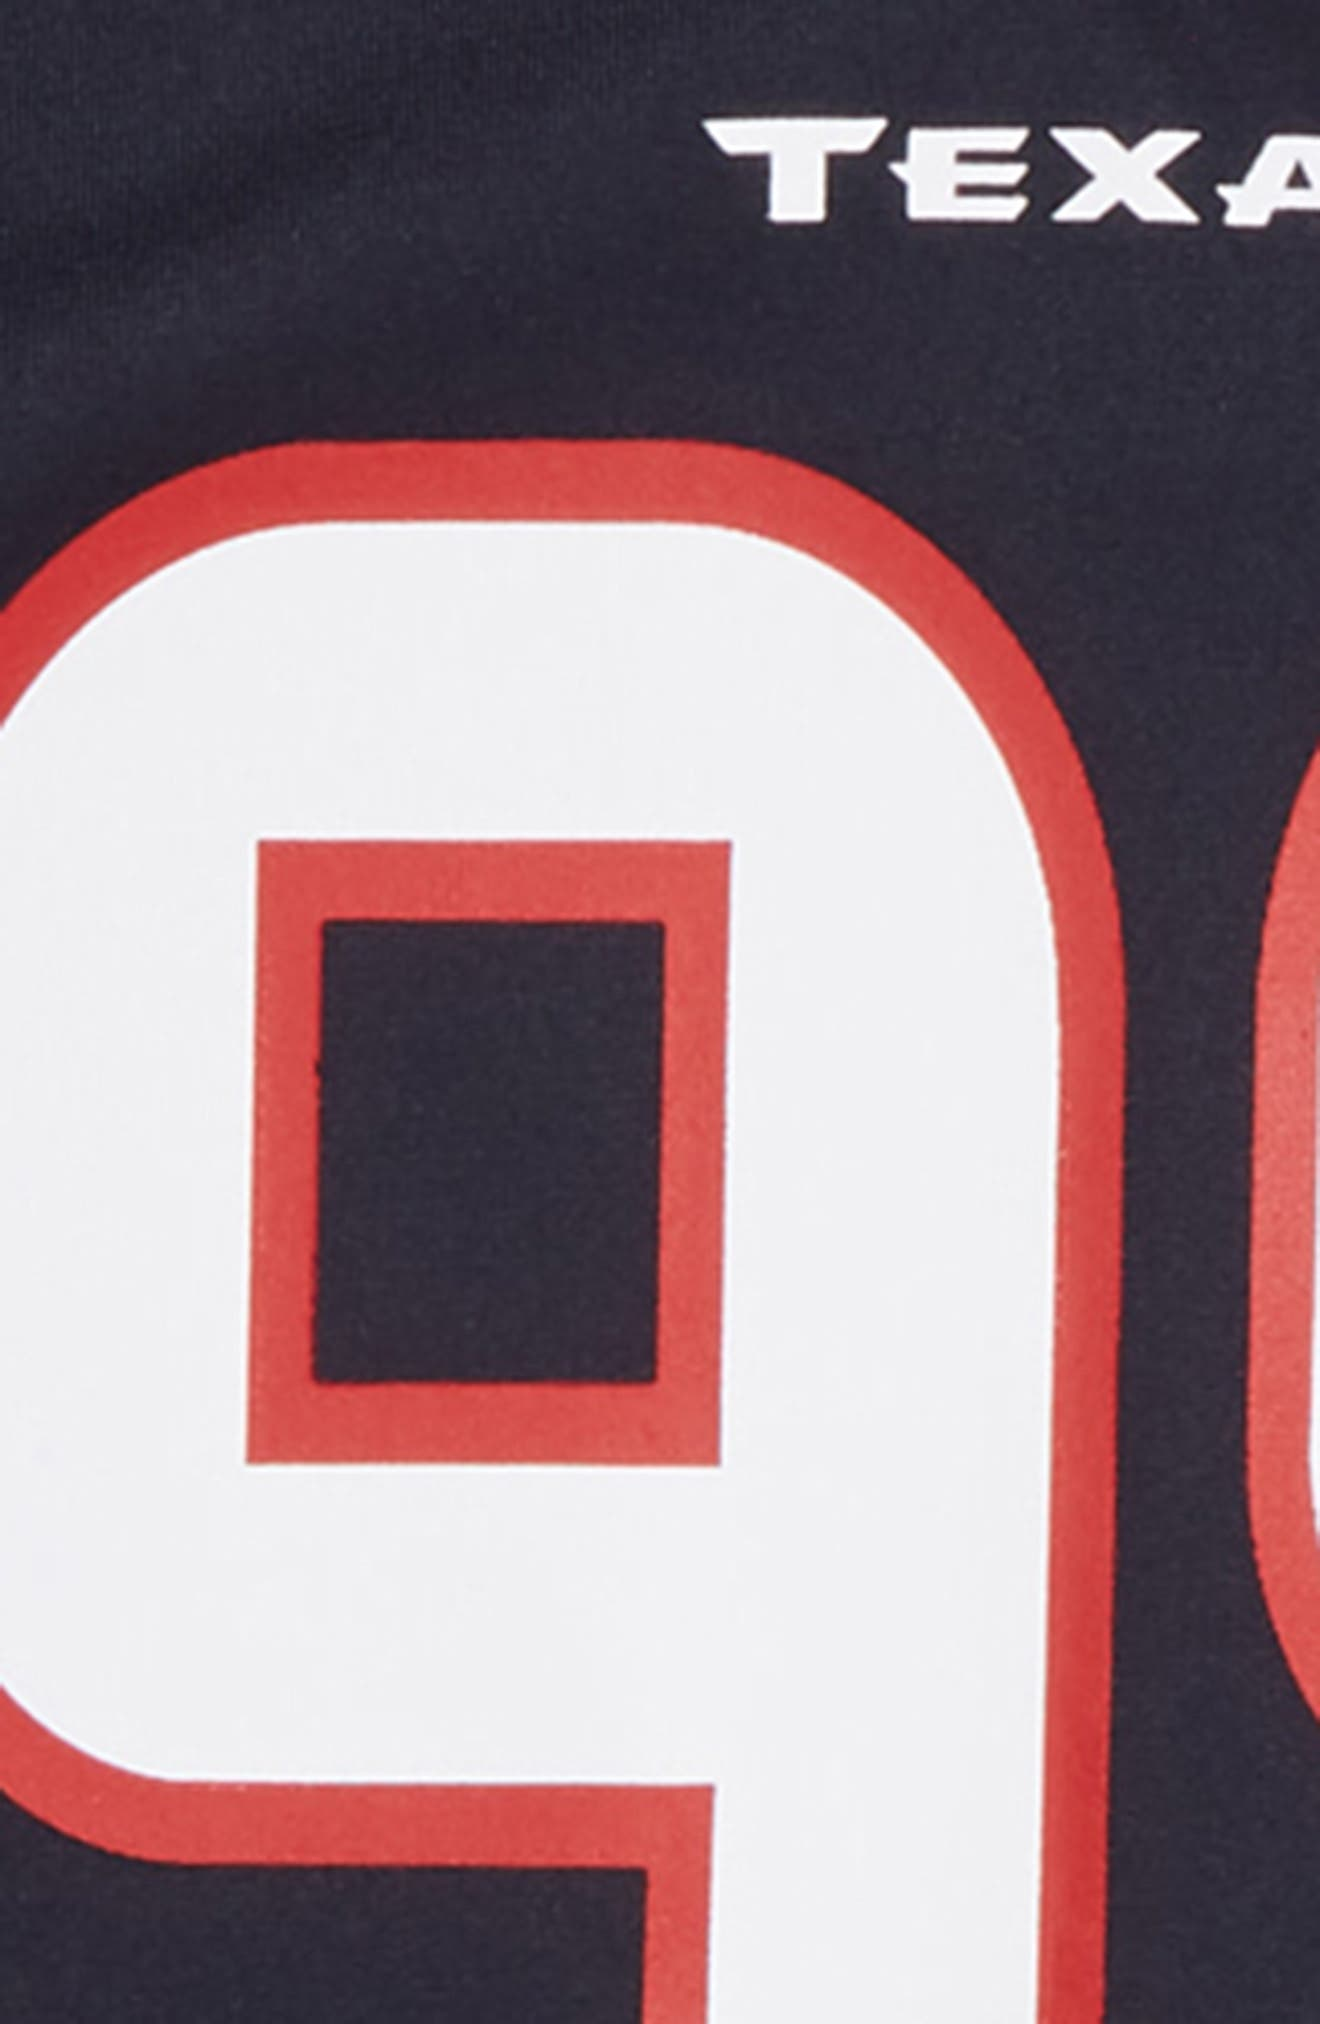 NFL Houston Texans JJ Watt Jersey,                             Alternate thumbnail 3, color,                             NAVY